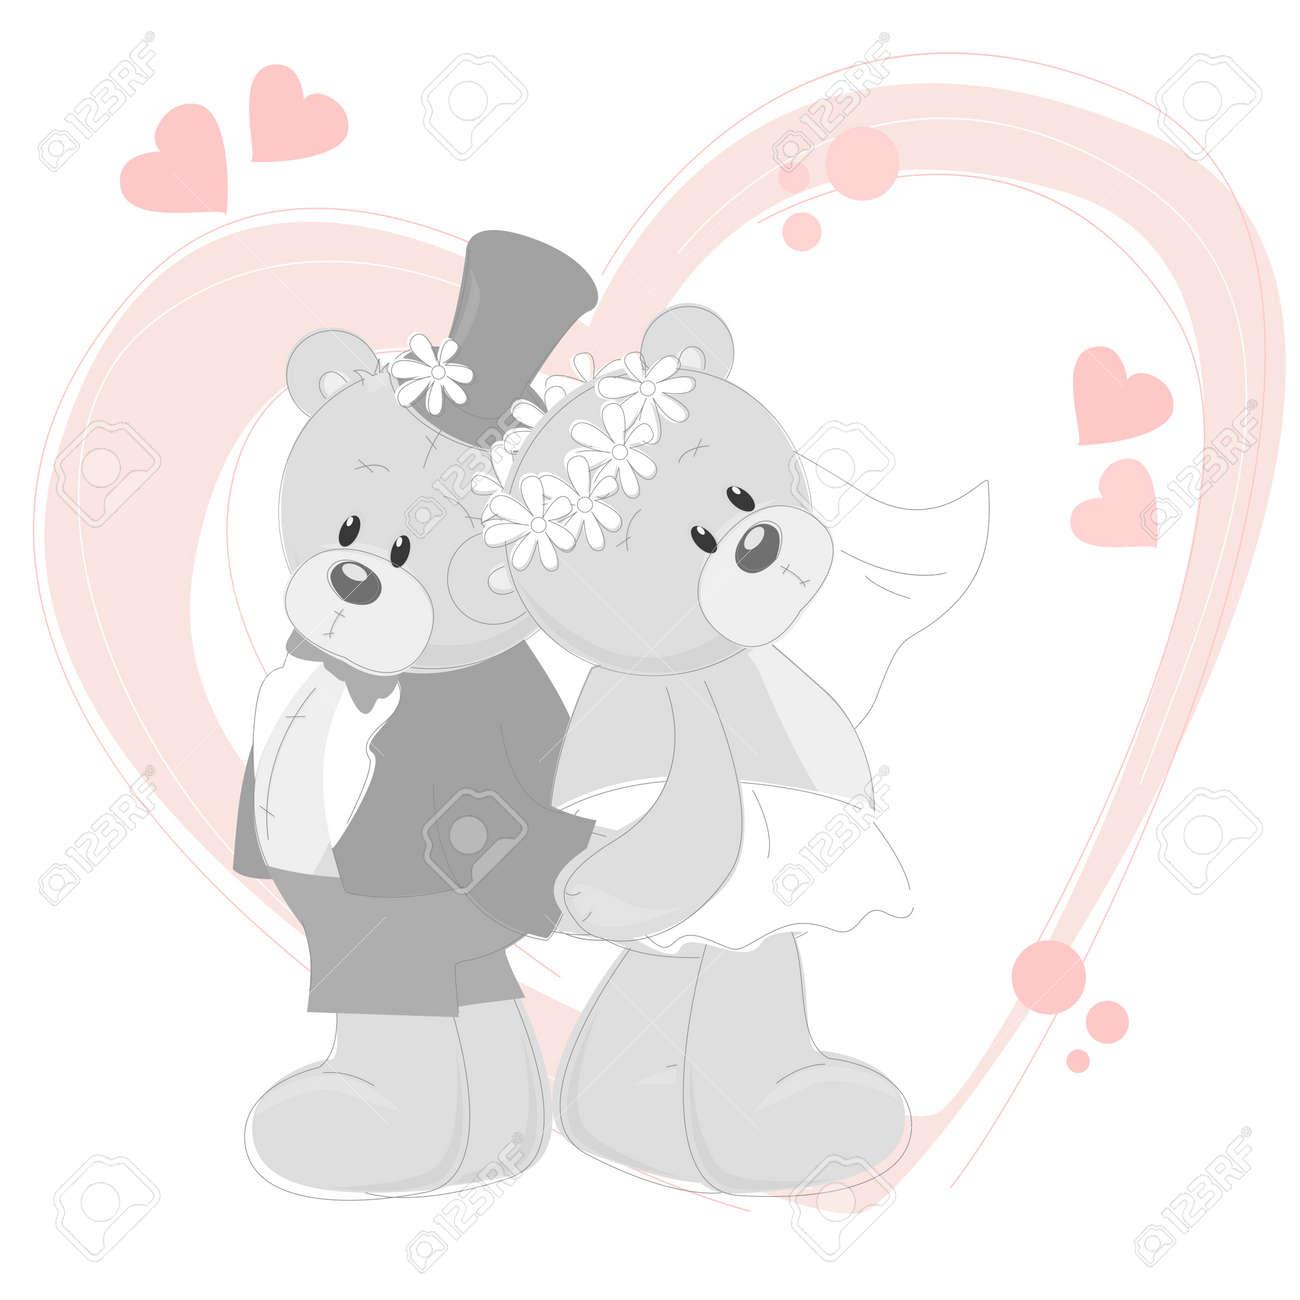 wedding invitation with cute teddy bears royalty free cliparts